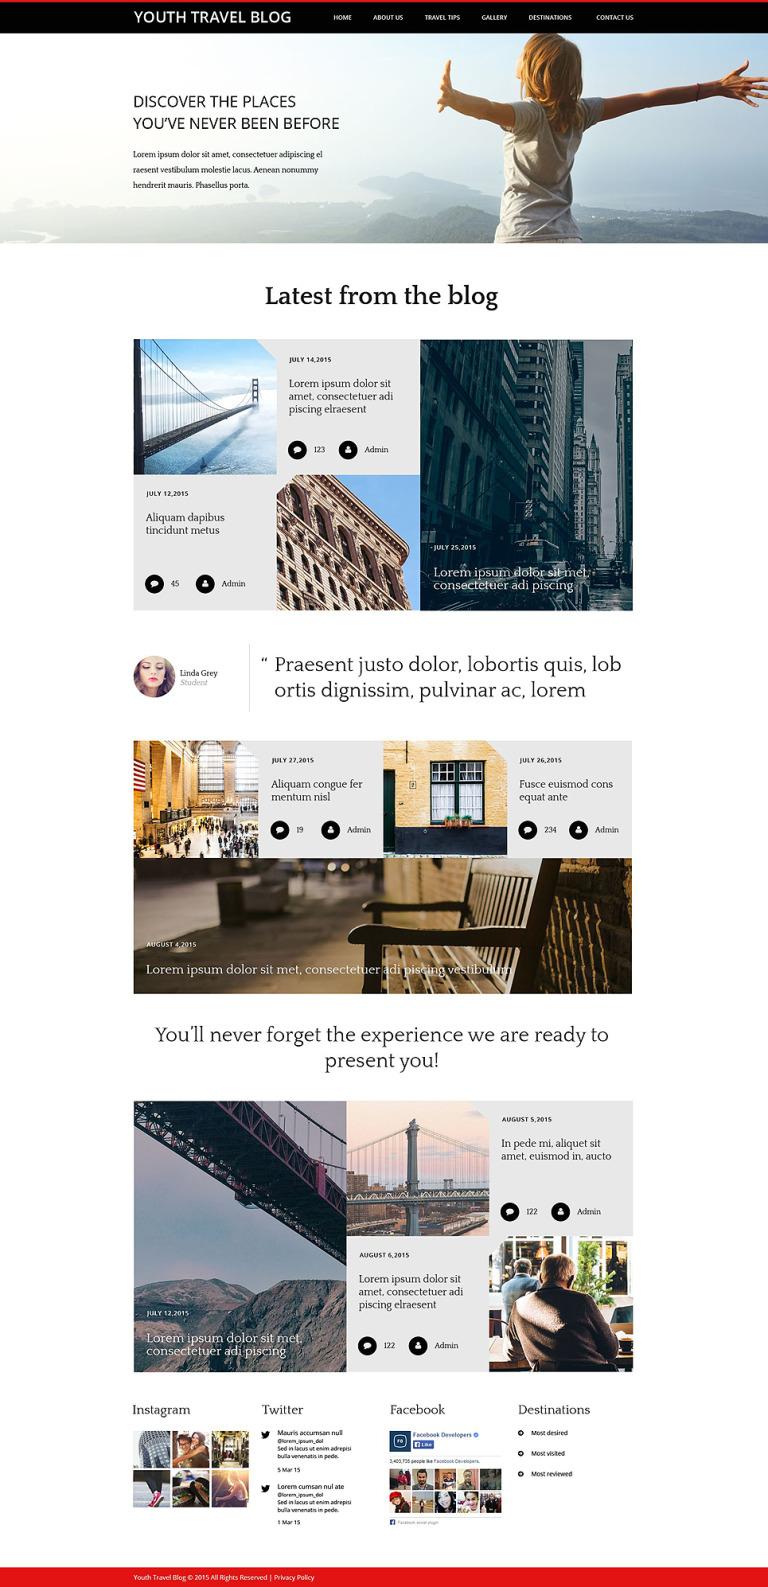 Youth Travel Blog Website Template New Screenshots BIG